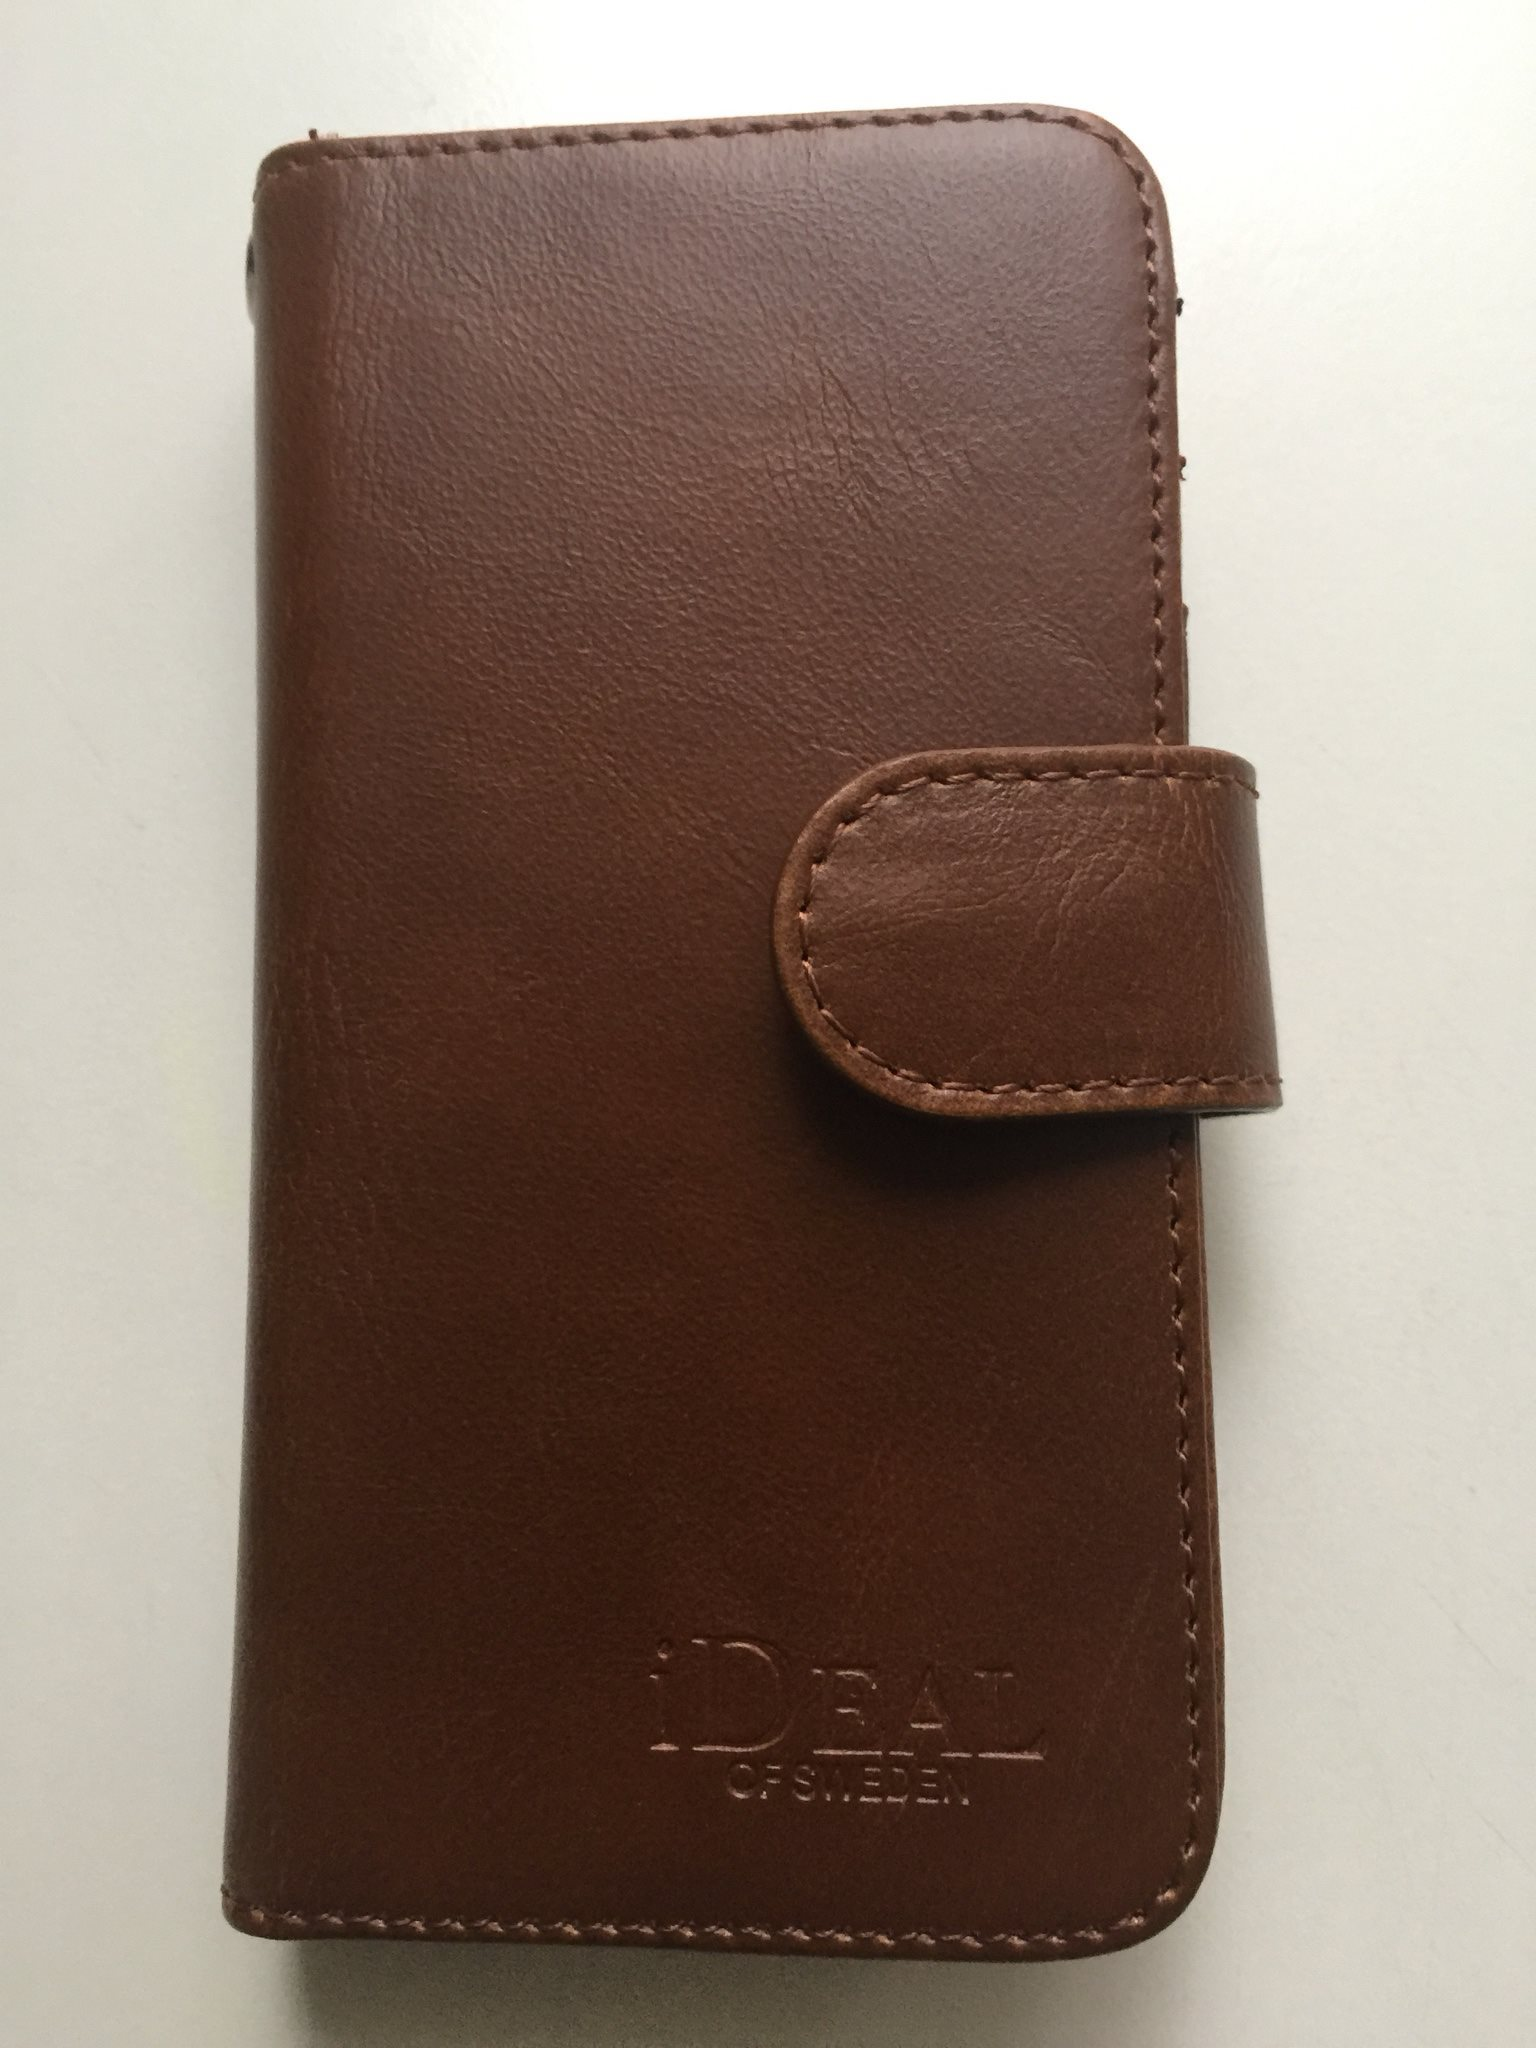 Mobil fodral äkta läder iphone 5 mobilplånbok (328253239) ᐈ Köp på ... 3c5b5ef874f80